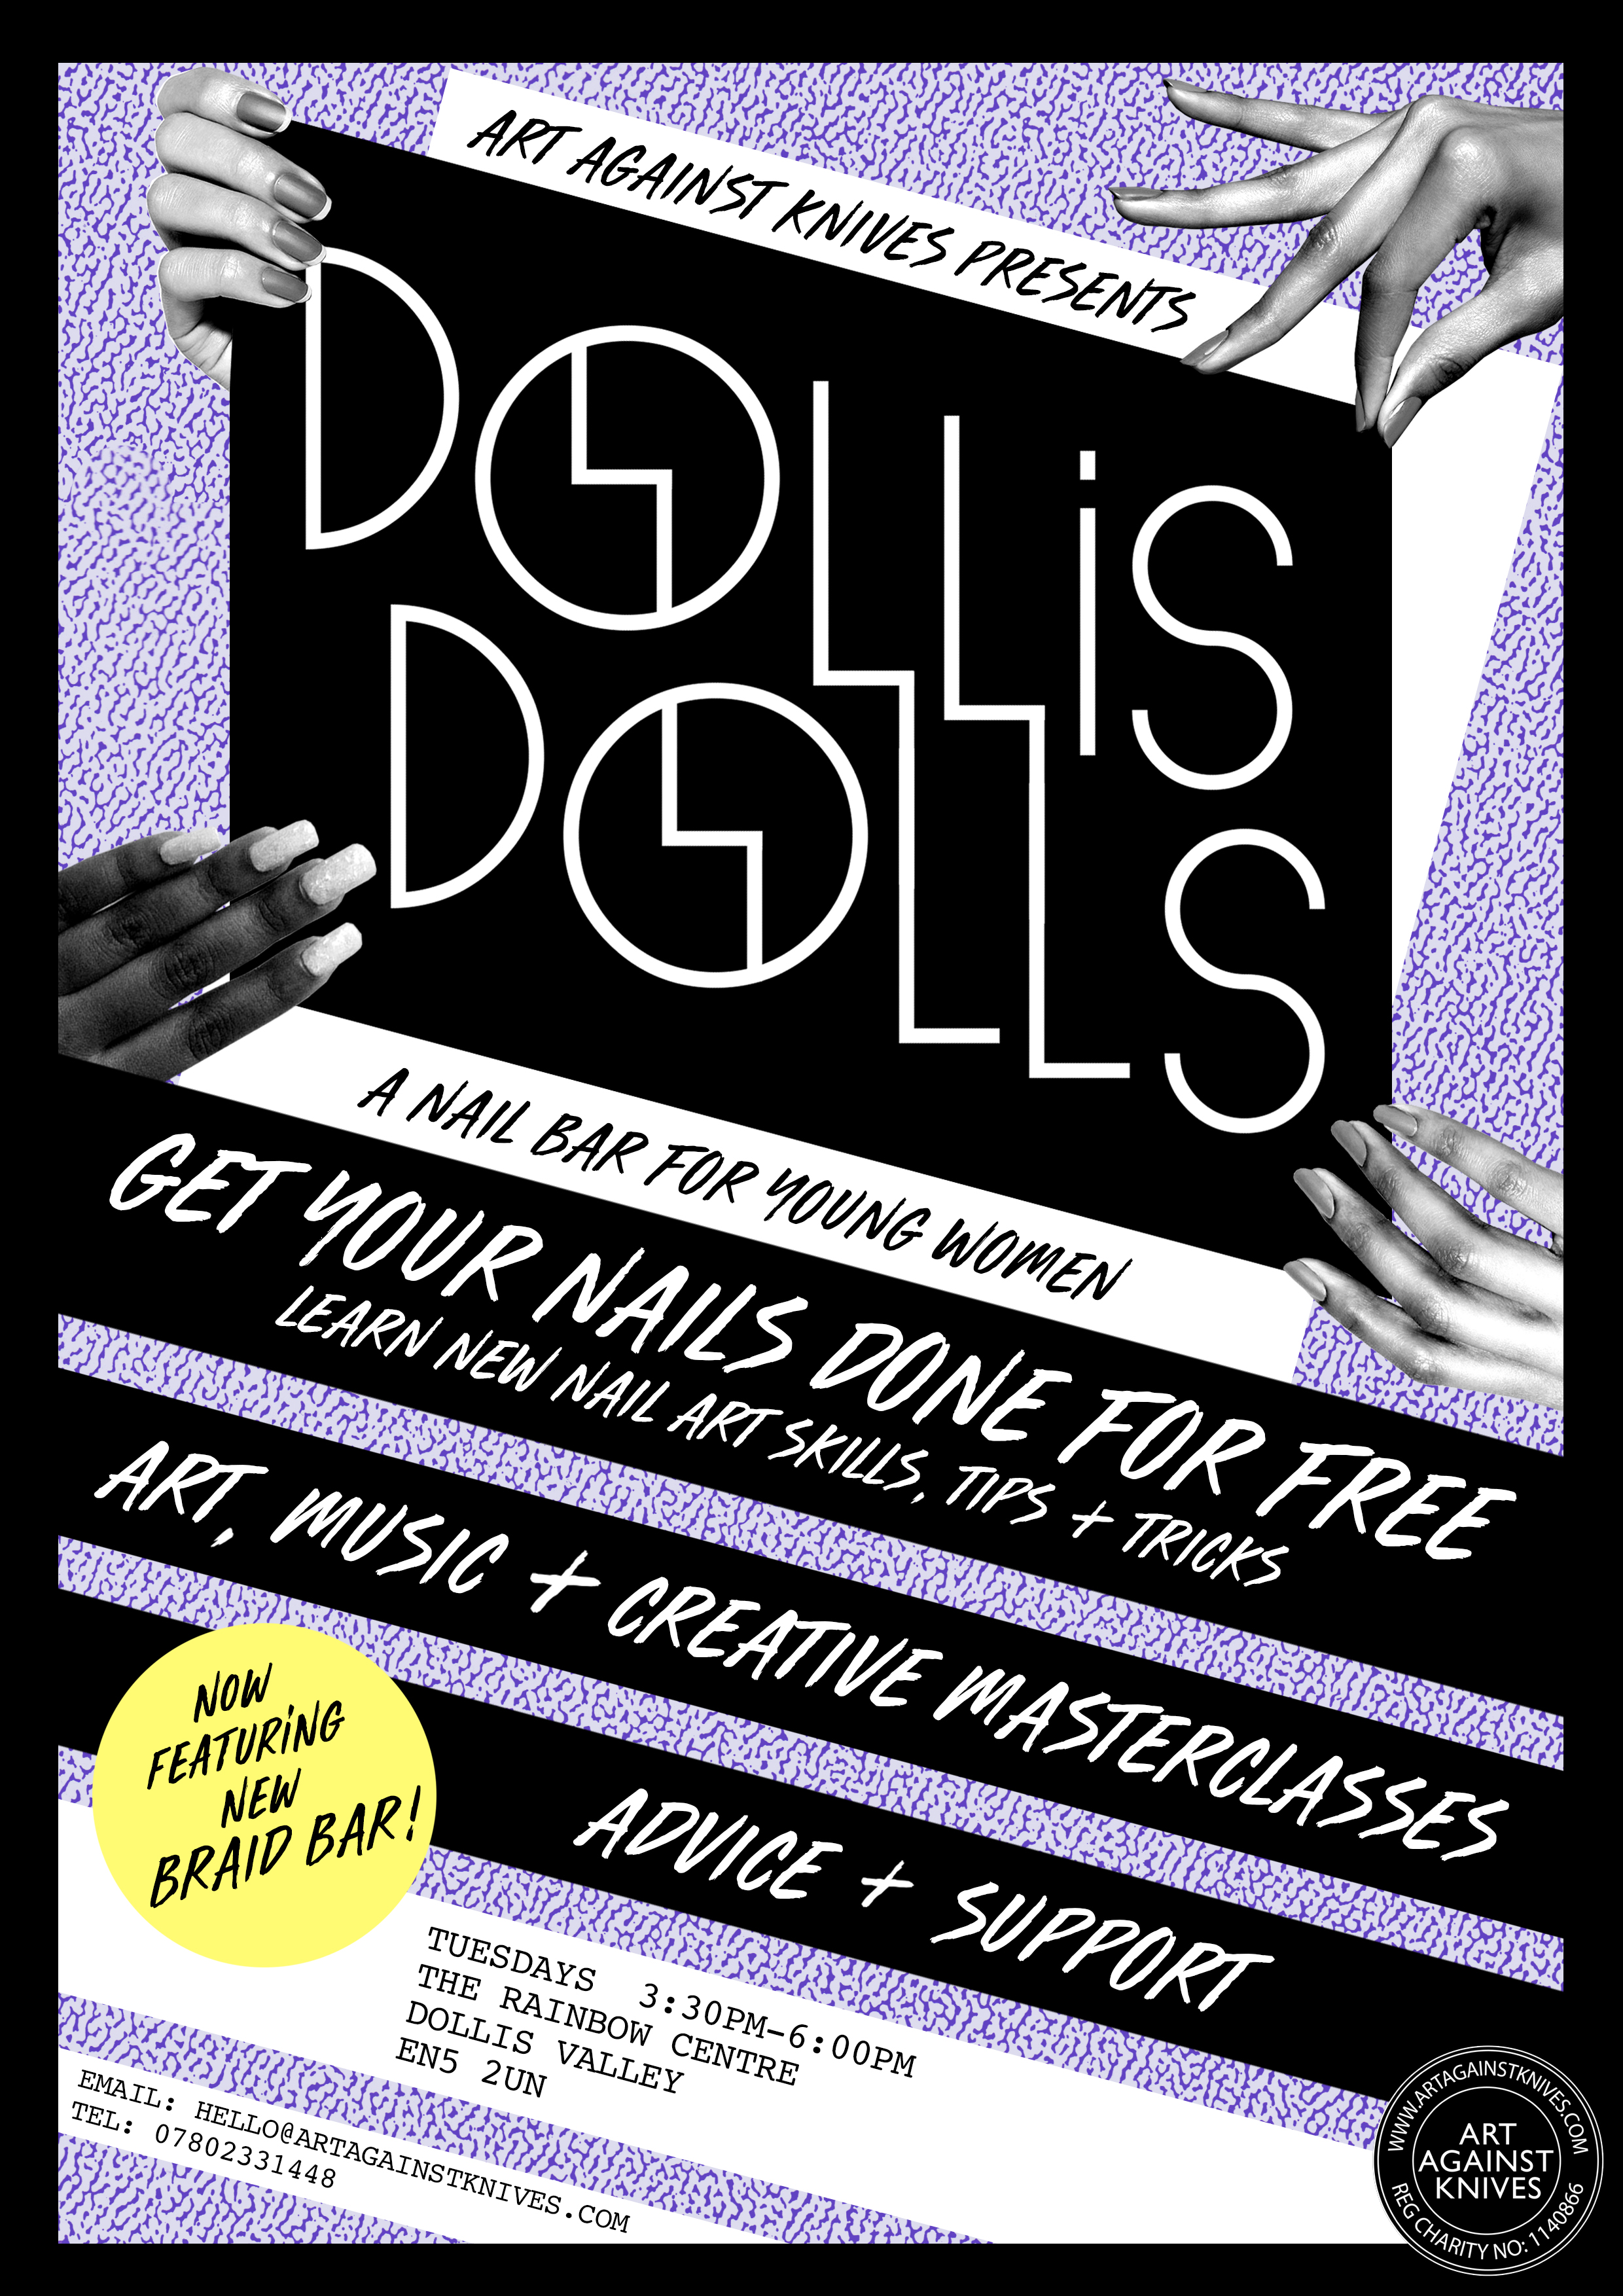 Dollis Dolls flyer.jpg